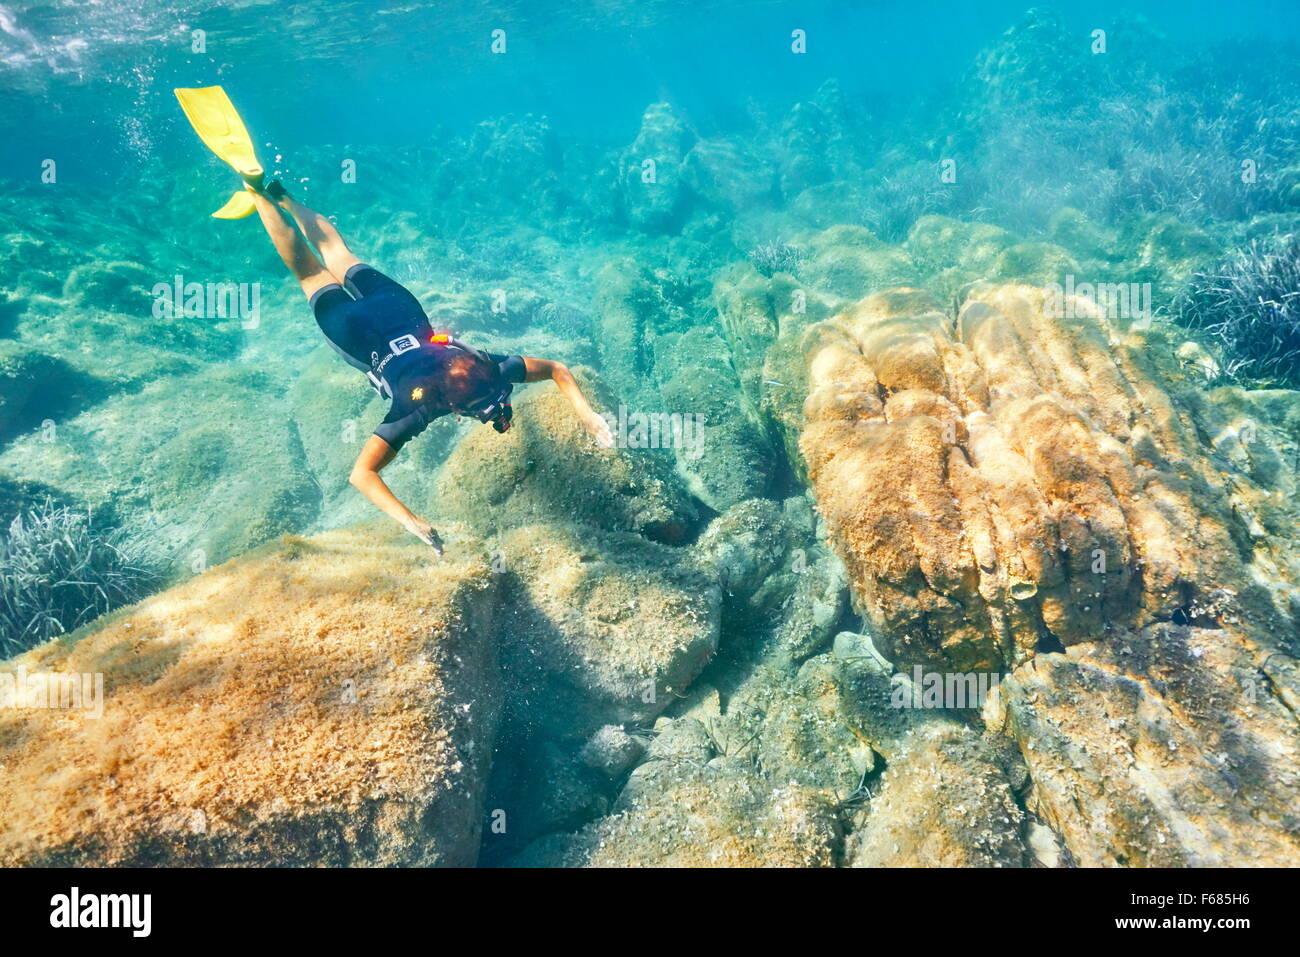 Woman snorkeling in the turquoise water, Punta dei Capriccioli, Costa Smeralda, Sardinia Island, Italy - Stock Image